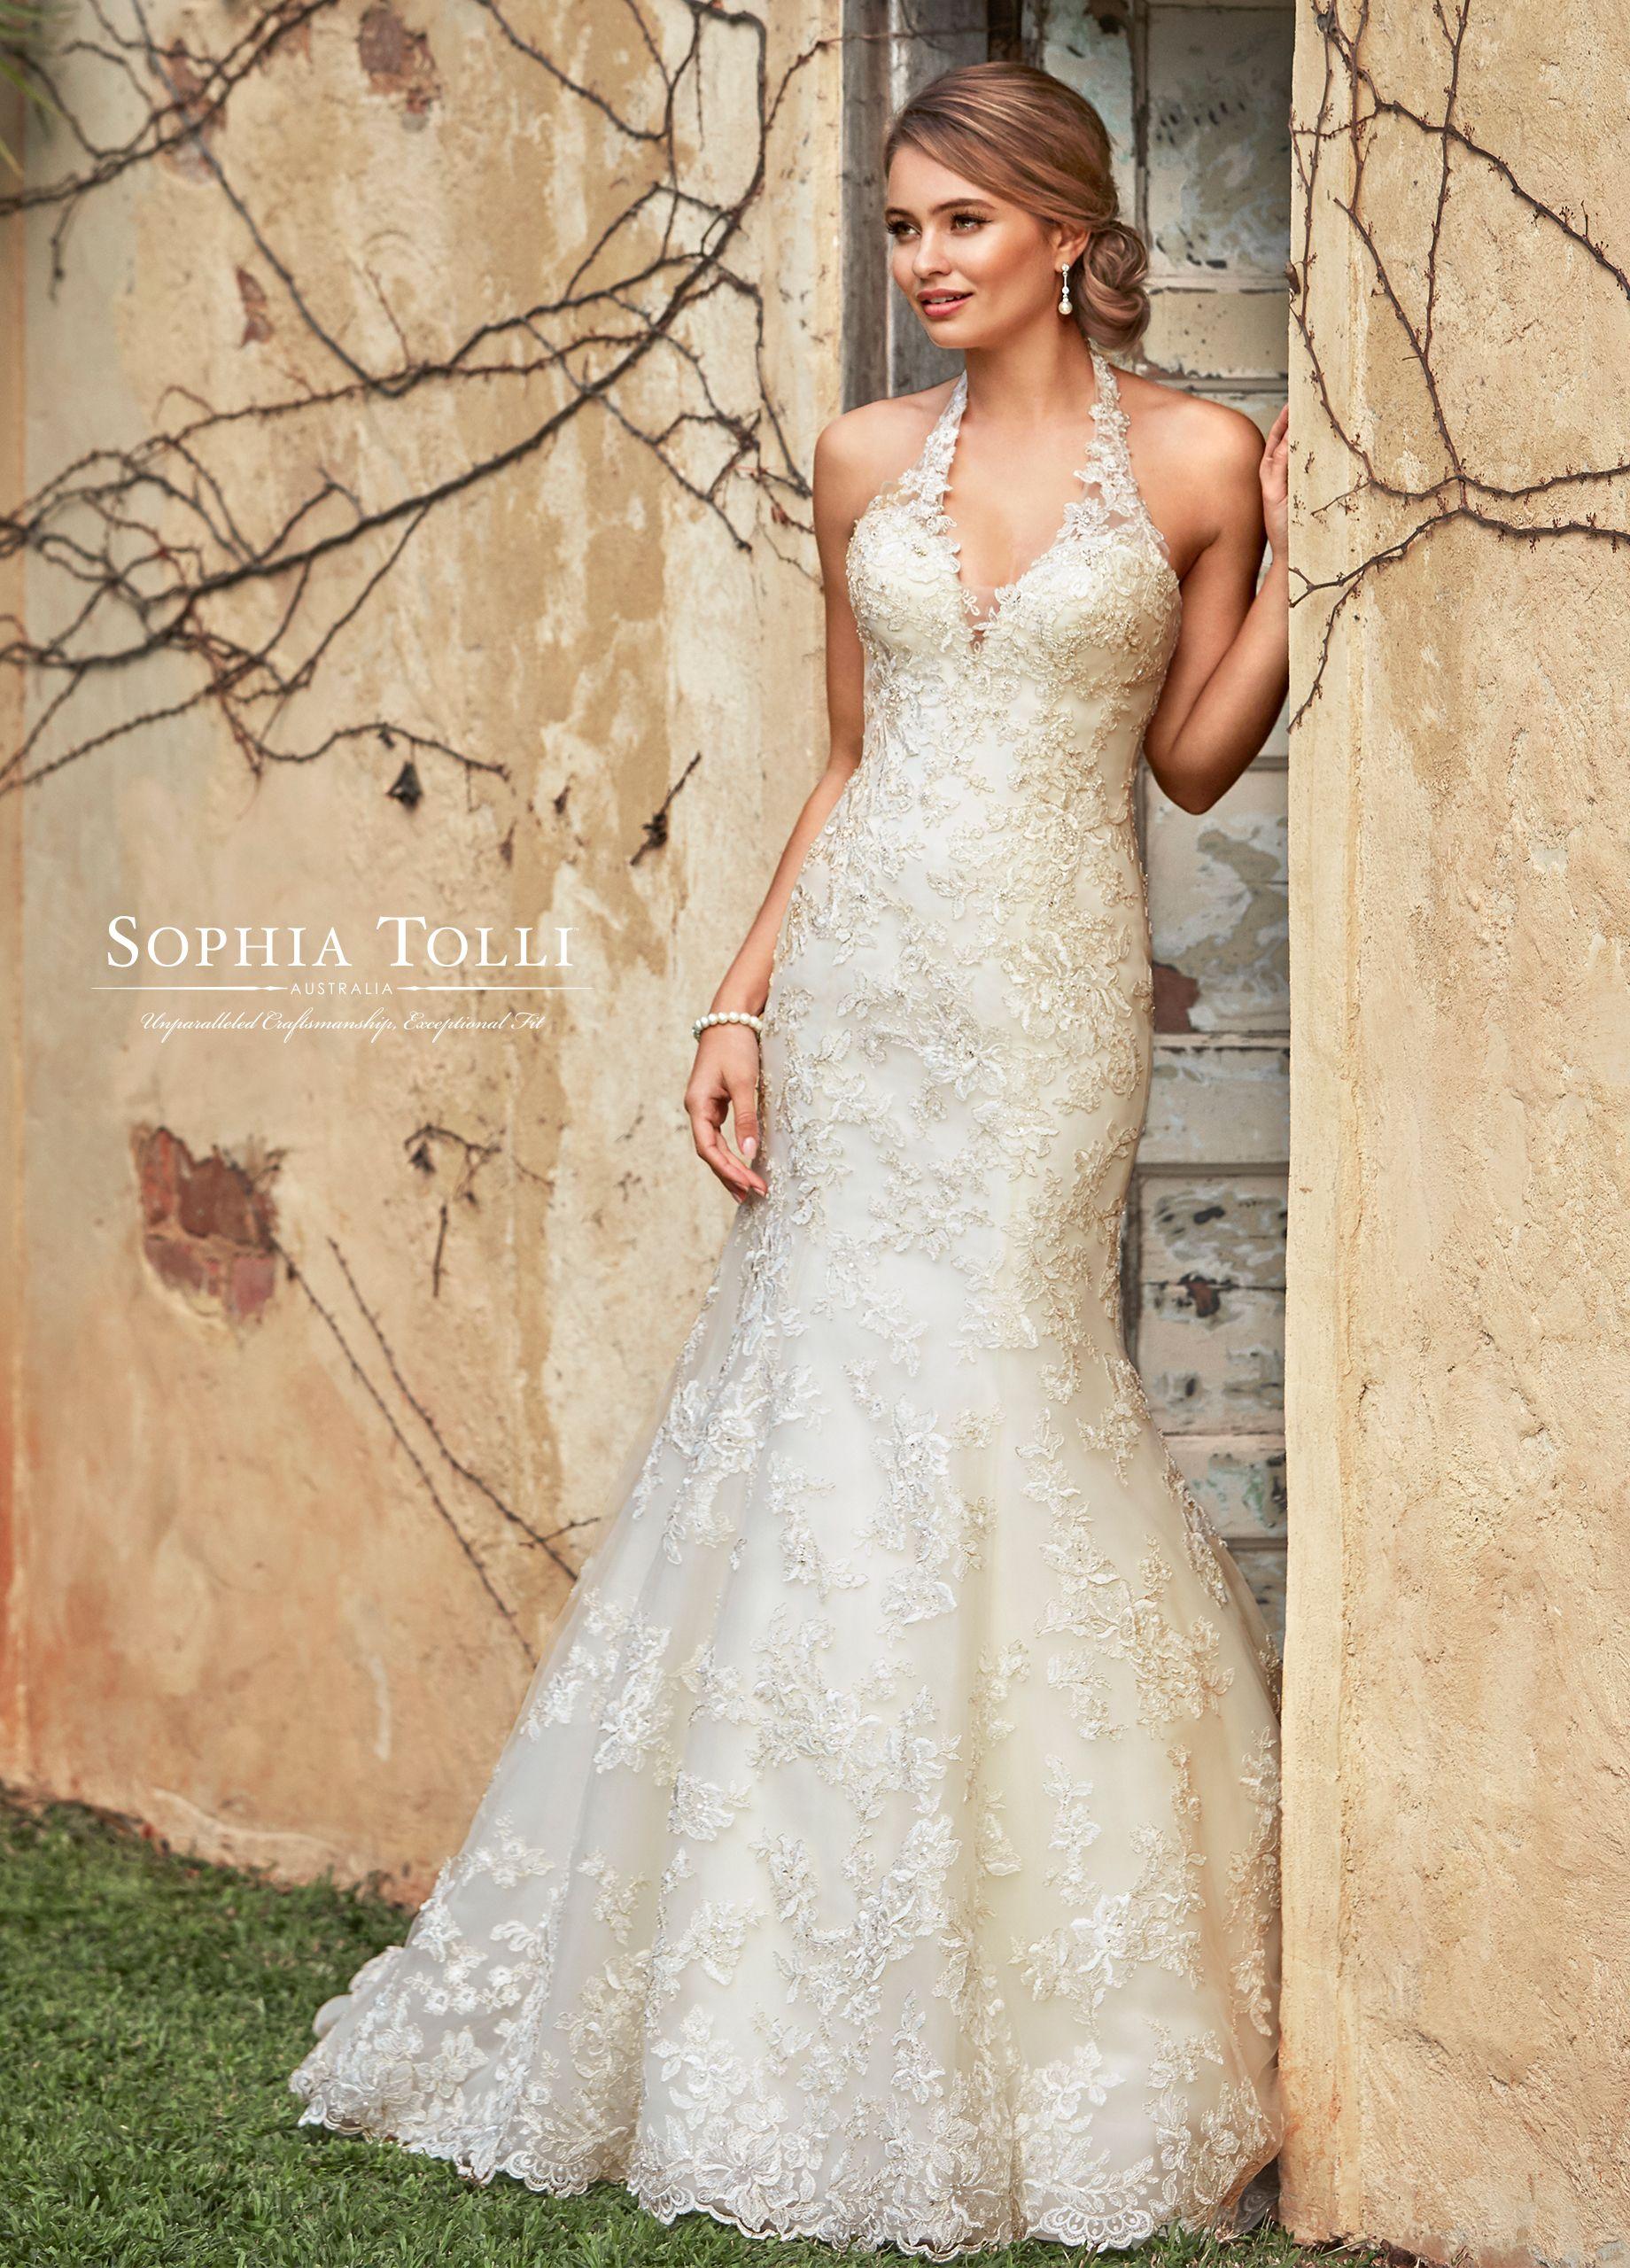 Sophia Tolli Marnie Sophia Tolli Top Wedding Dresses Halter Top Wedding Dress Wedding Dresses [ 2560 x 1840 Pixel ]